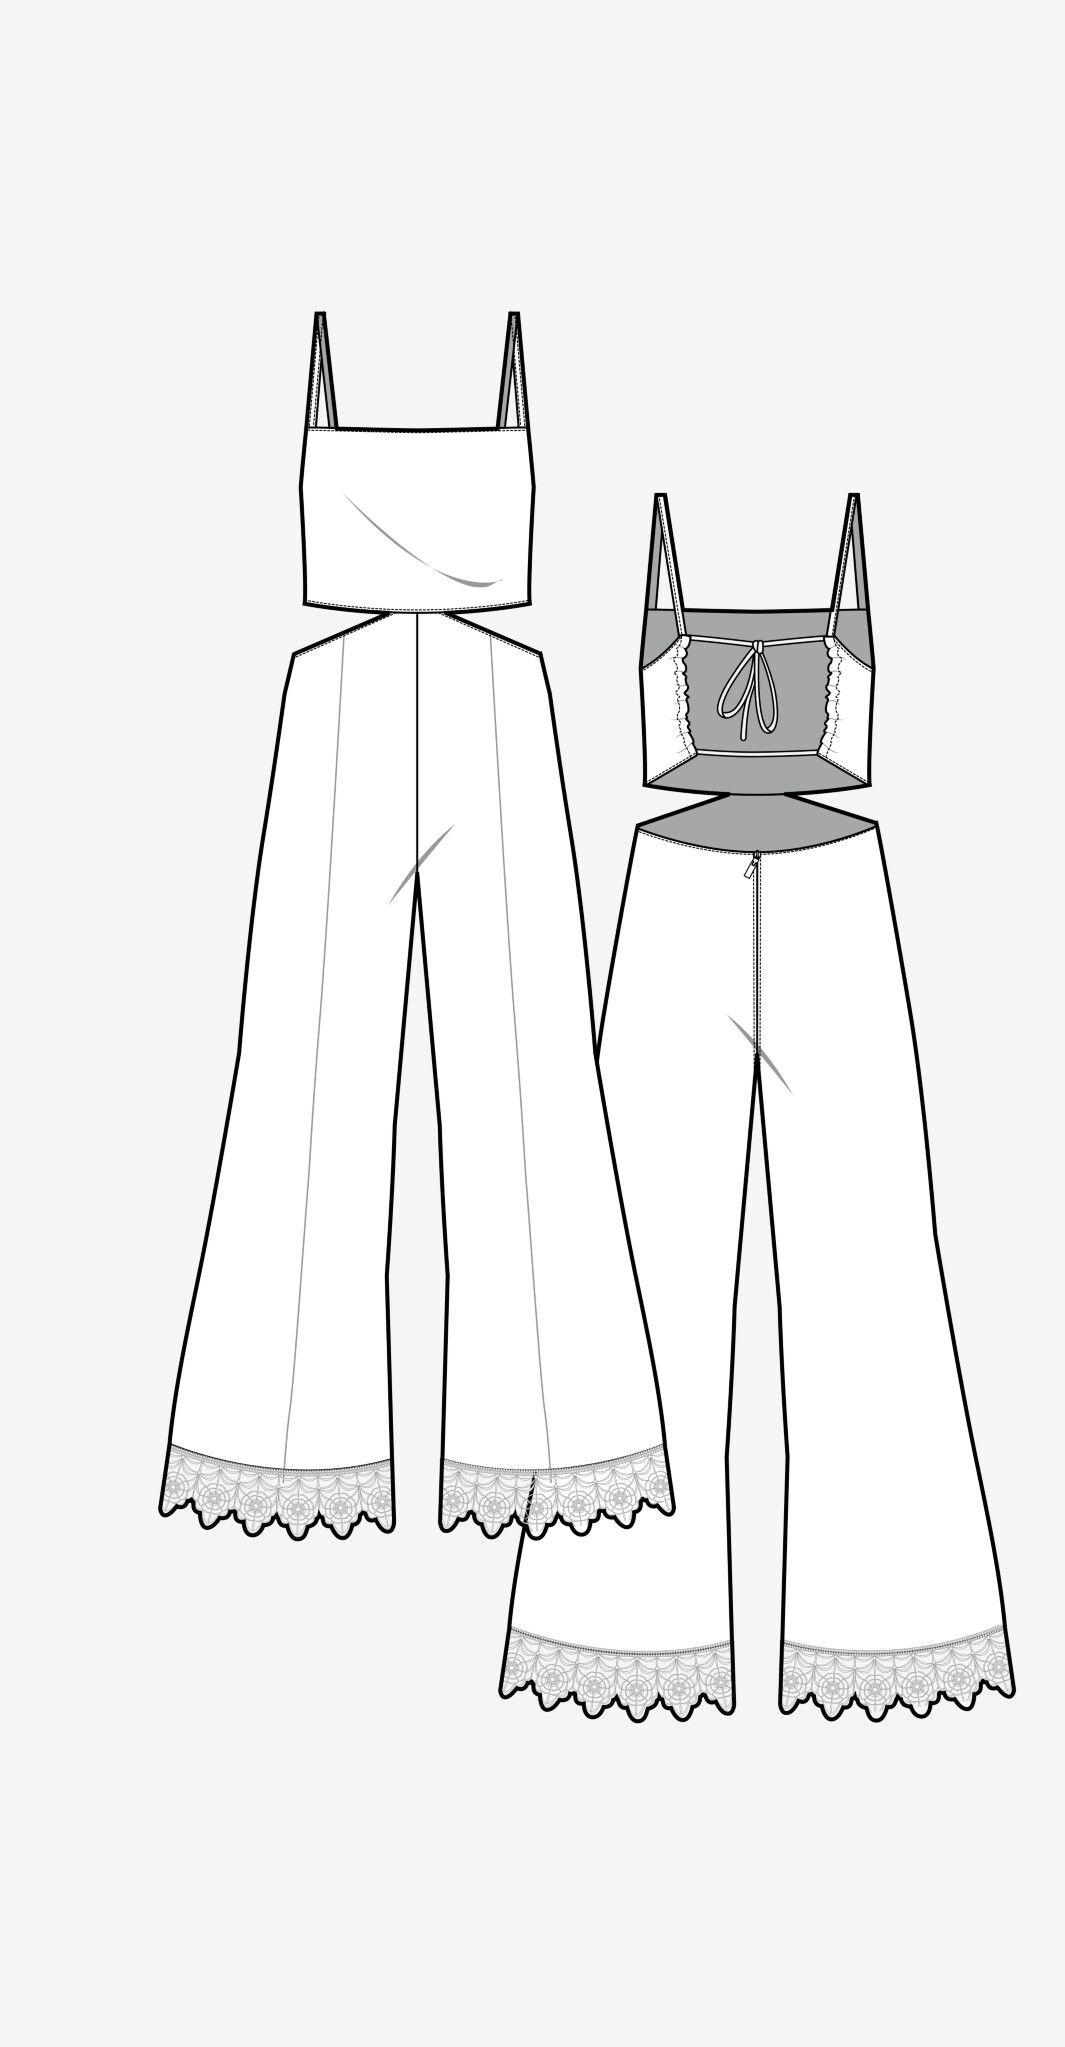 Ss19 pinafore jumpsuit silhouette wgsn design development